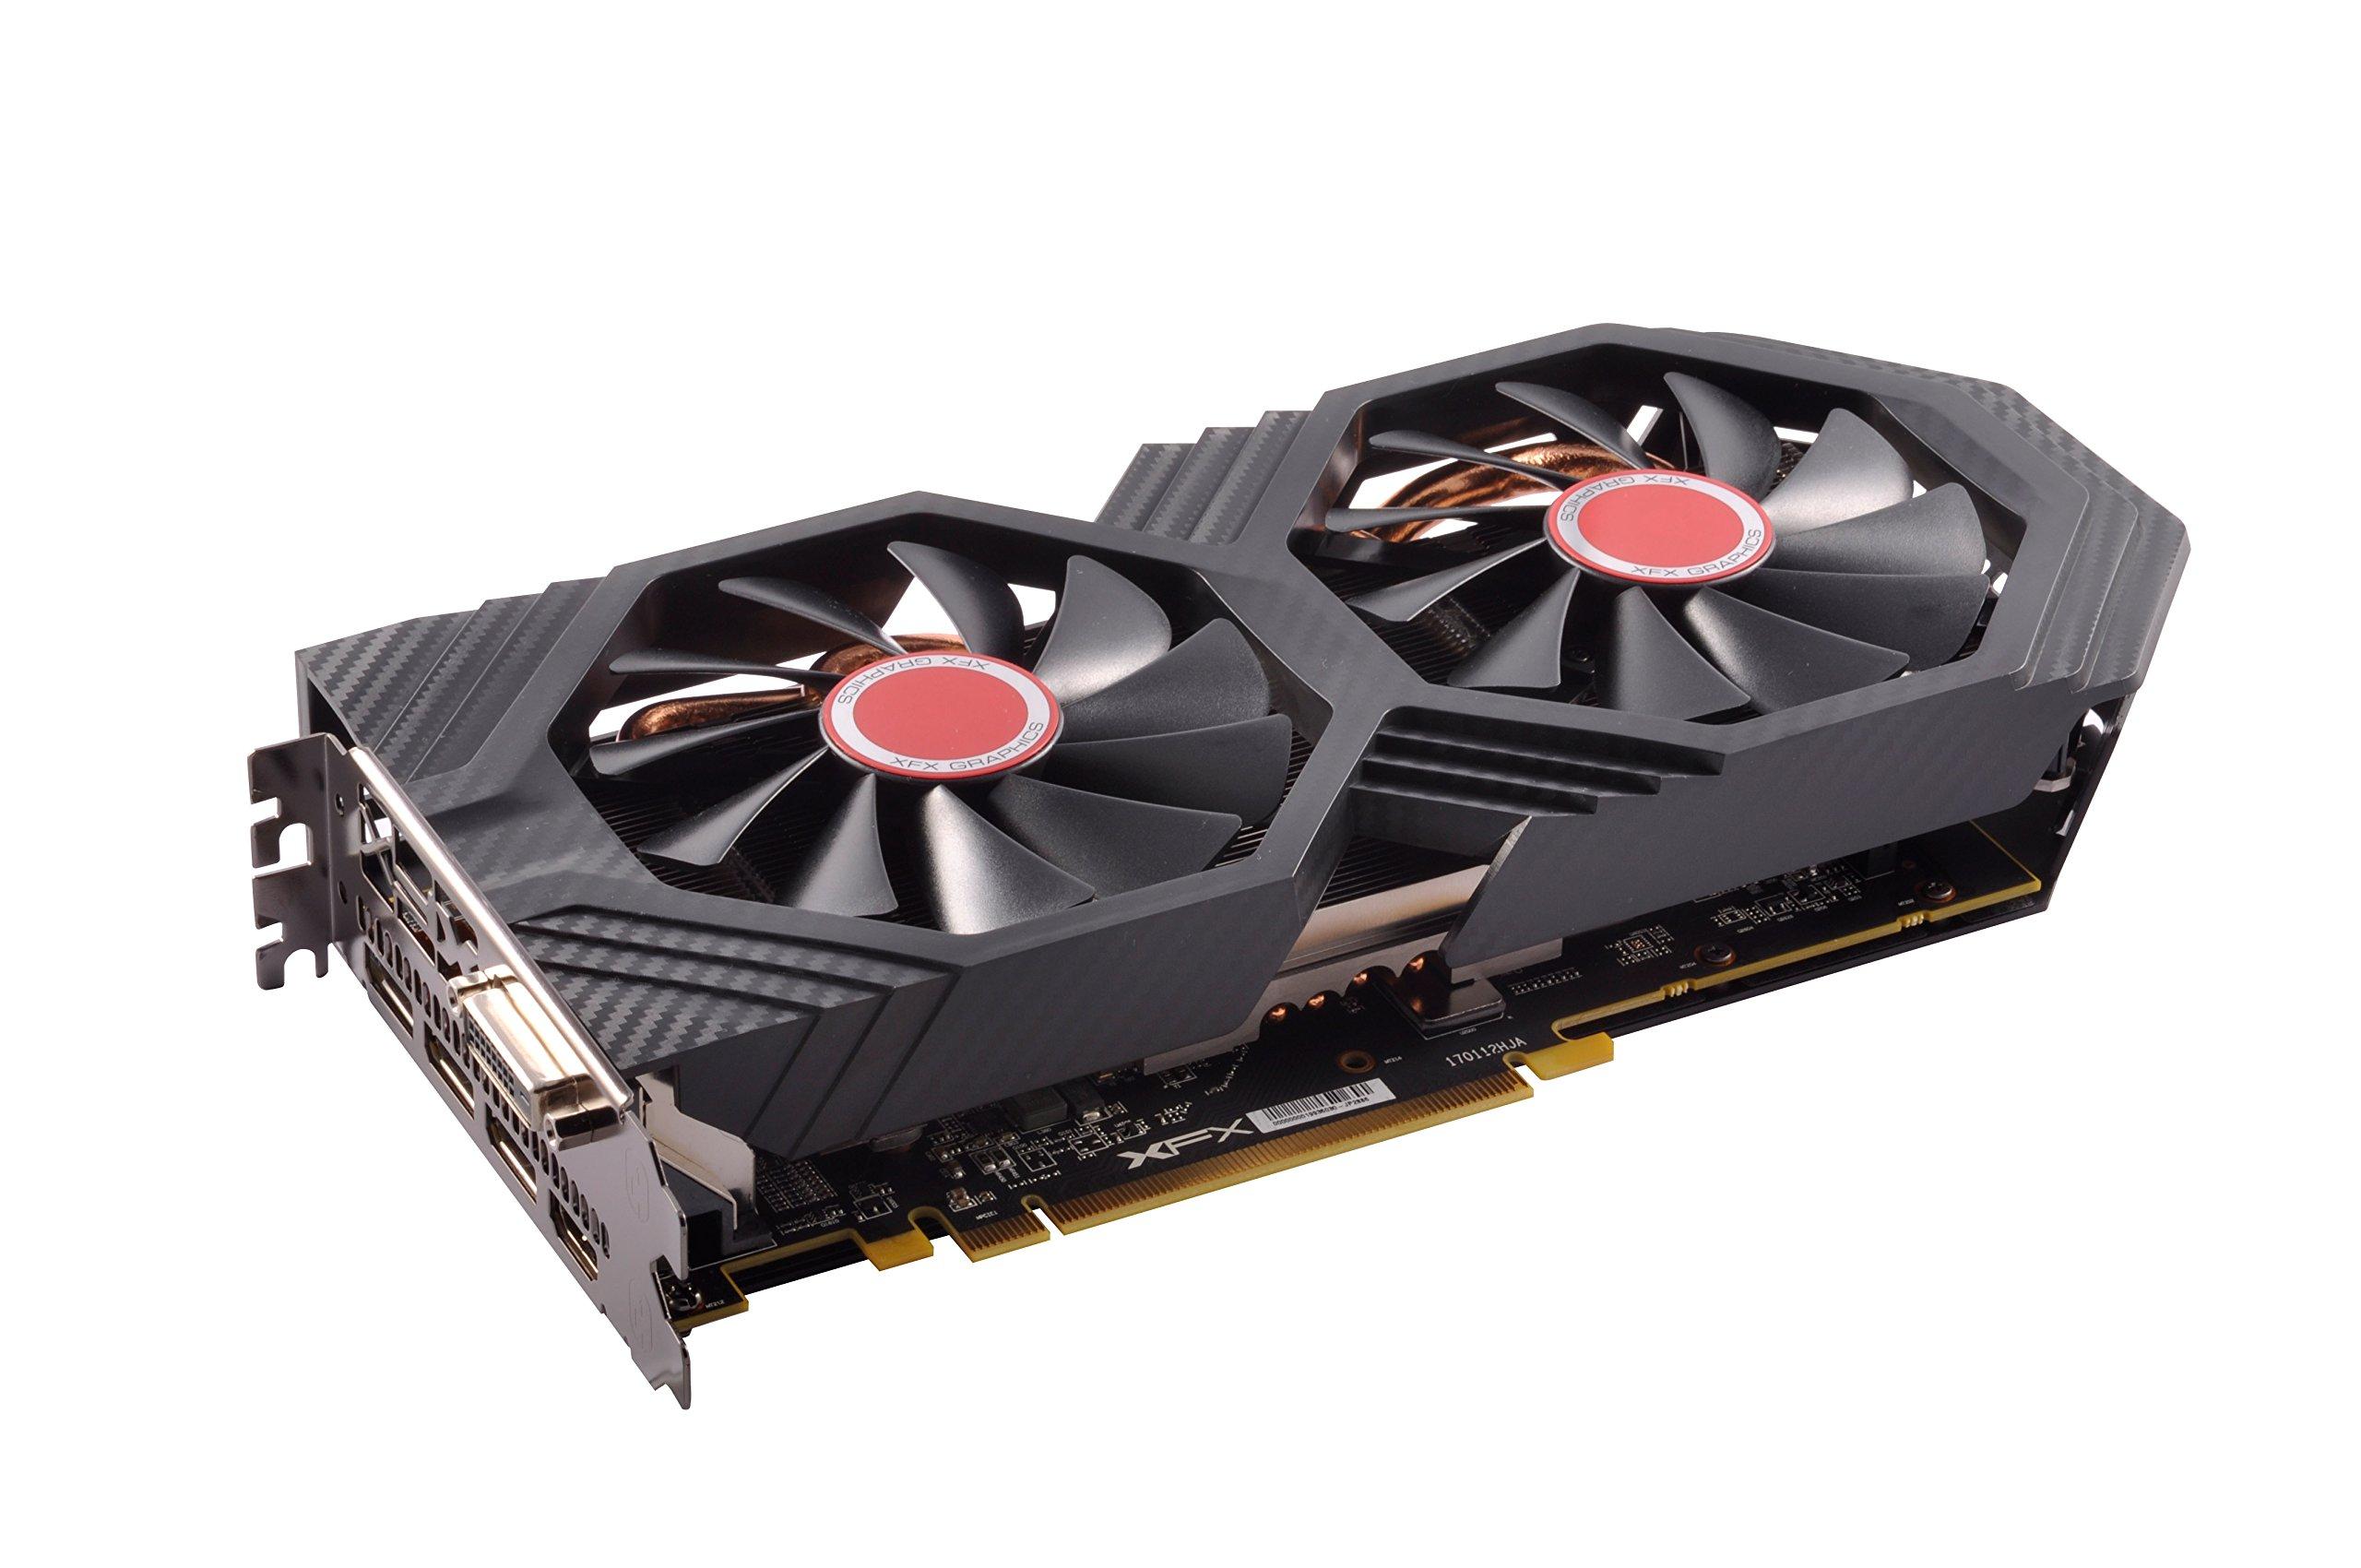 XFX Radeon RX 580 GTS XXX Edition 1386MHz OC+, 8GB GDDR5, VR Ready, Dual BIOS, 3xDP HDMI DVI, AMD Graphics Card (RX-580P8DFD6) by XFX